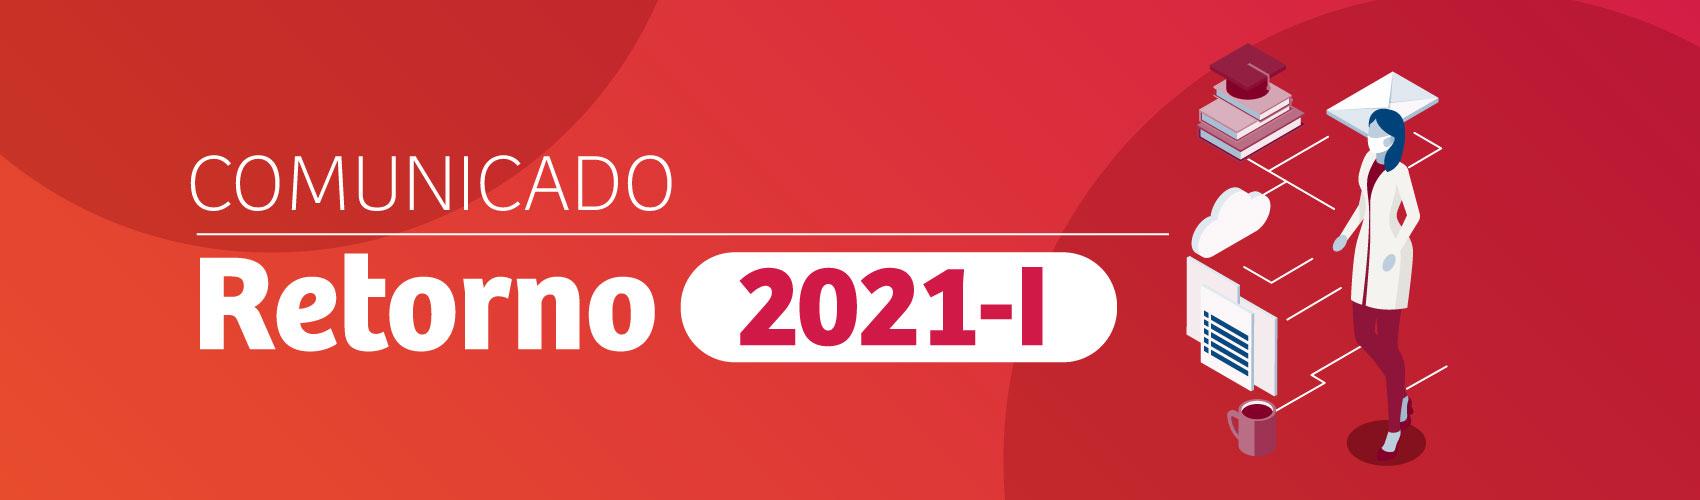 header-retorno-2021-pt2-upc